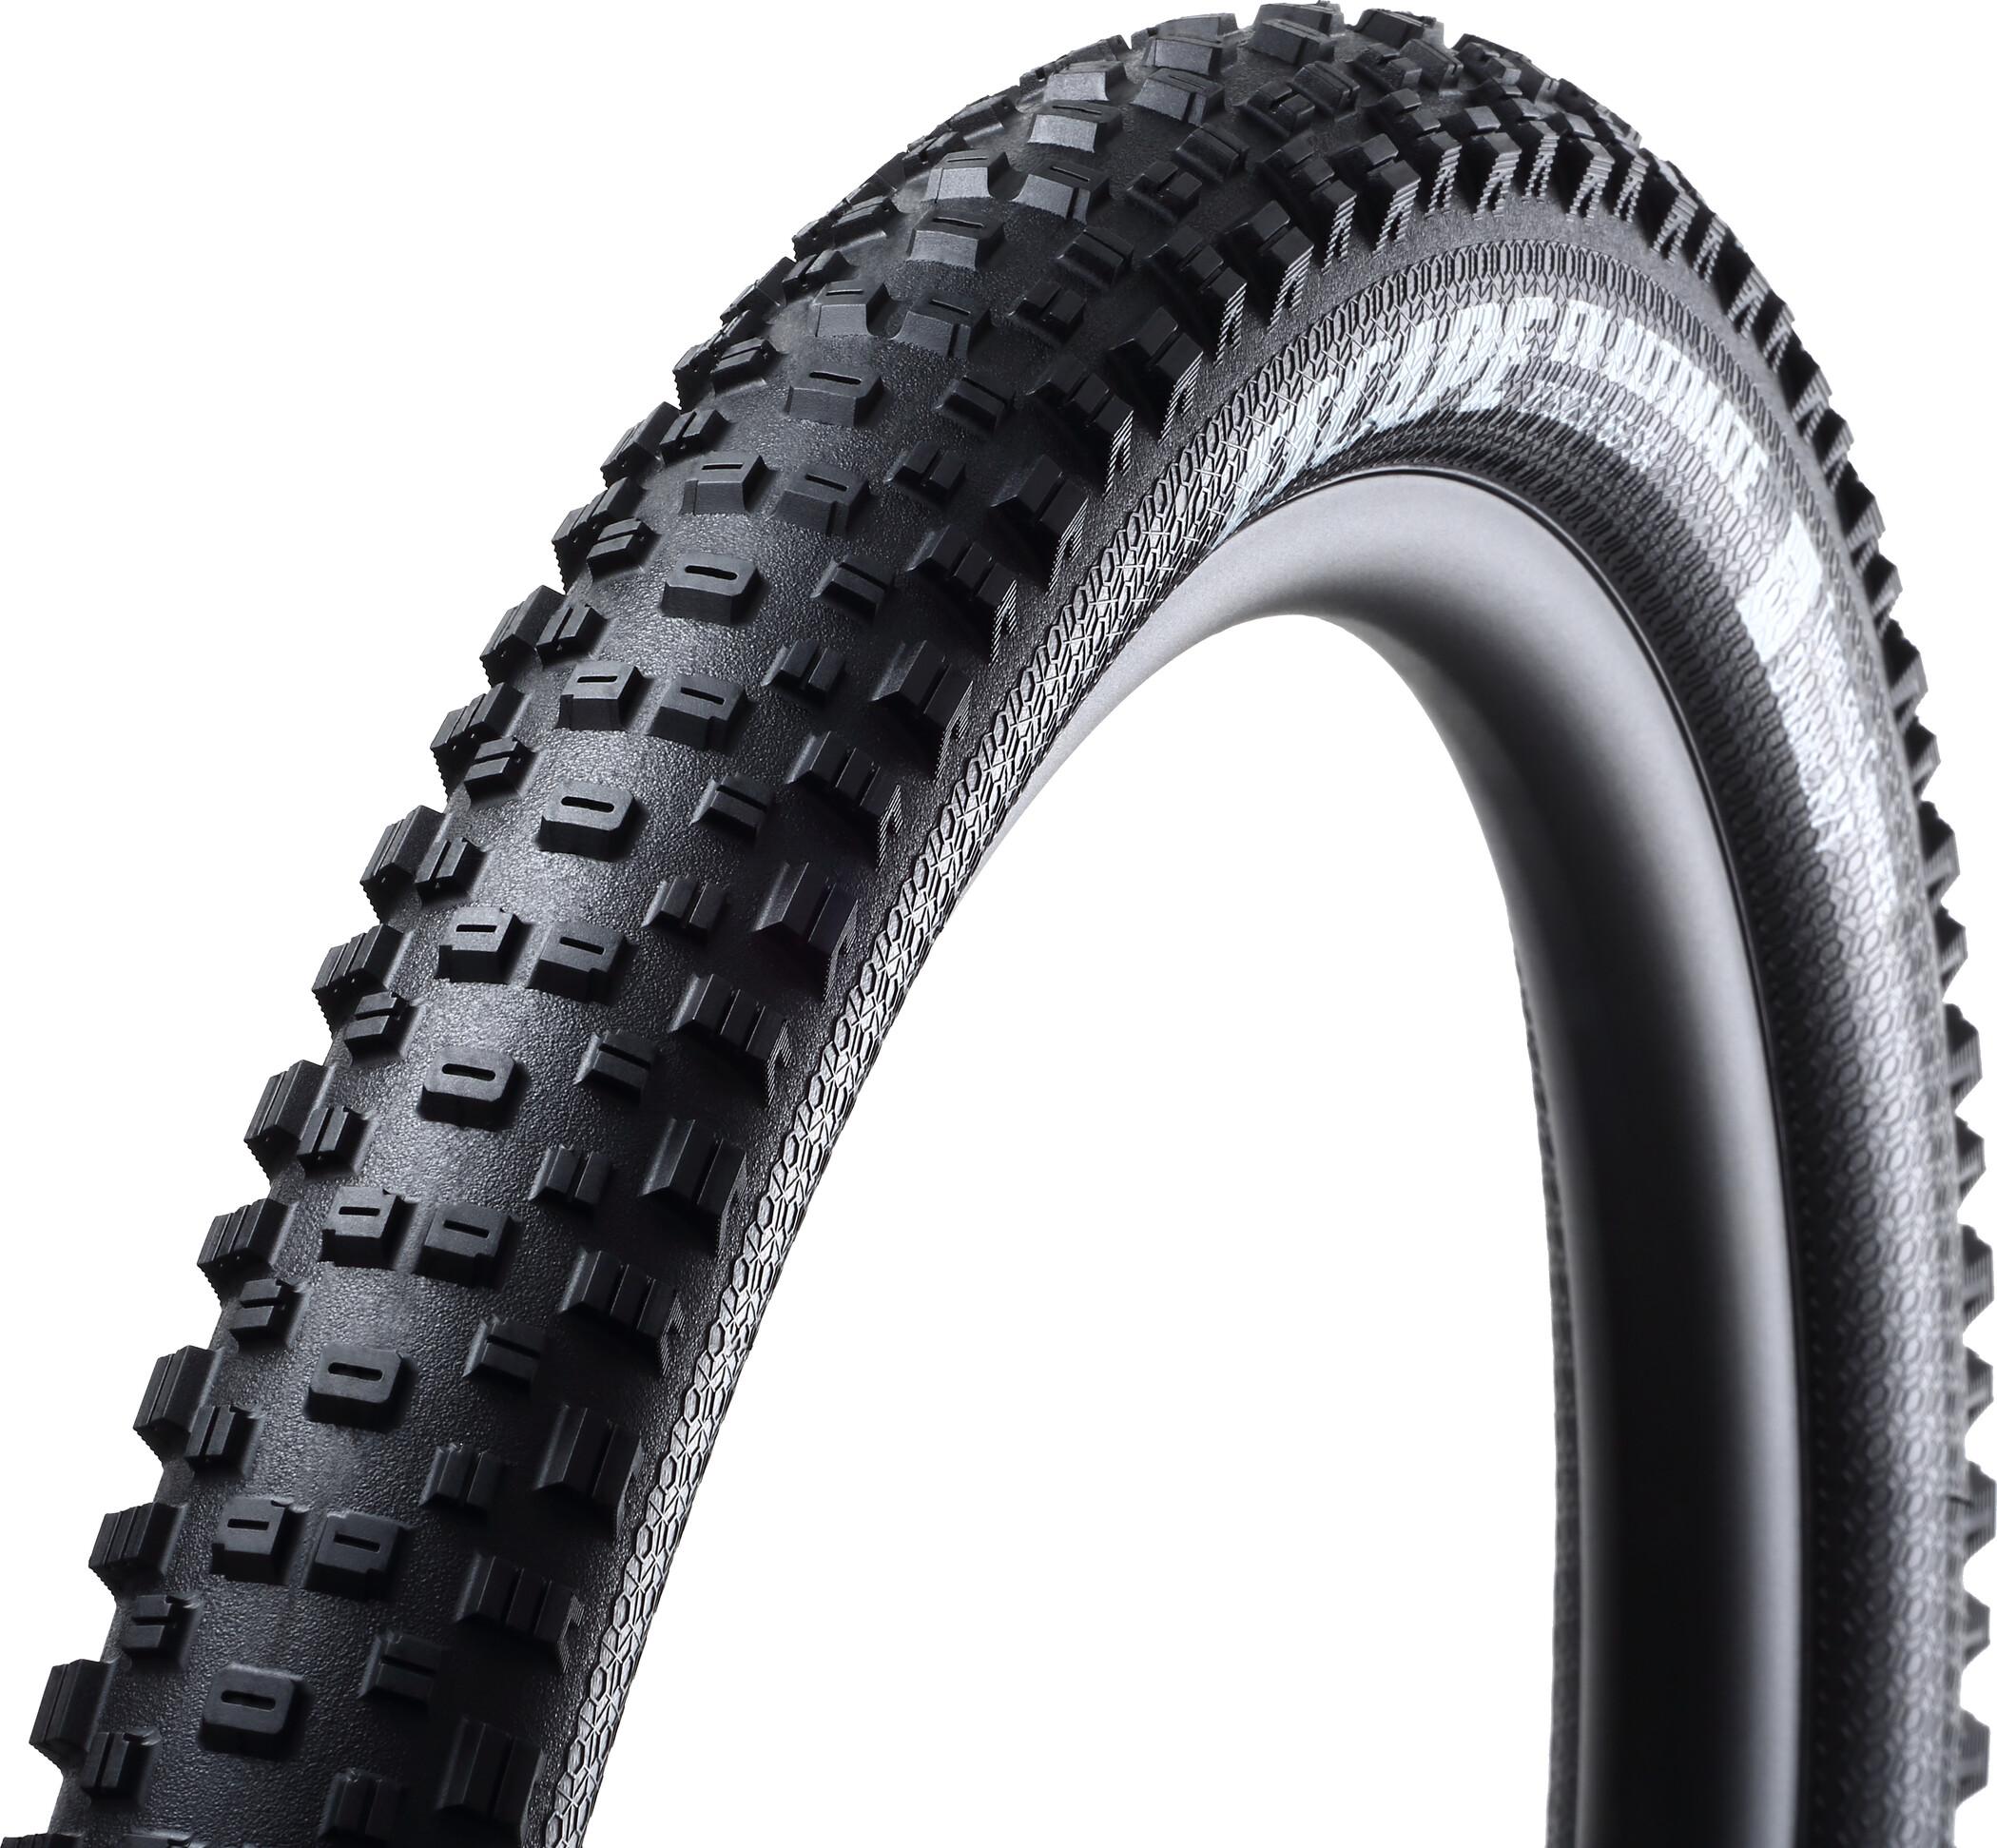 Goodyear Escape EN Ultimate Foldedæk 66-584 Tubeless Complete Dynamic R/T e25, black (2019)   Tyres